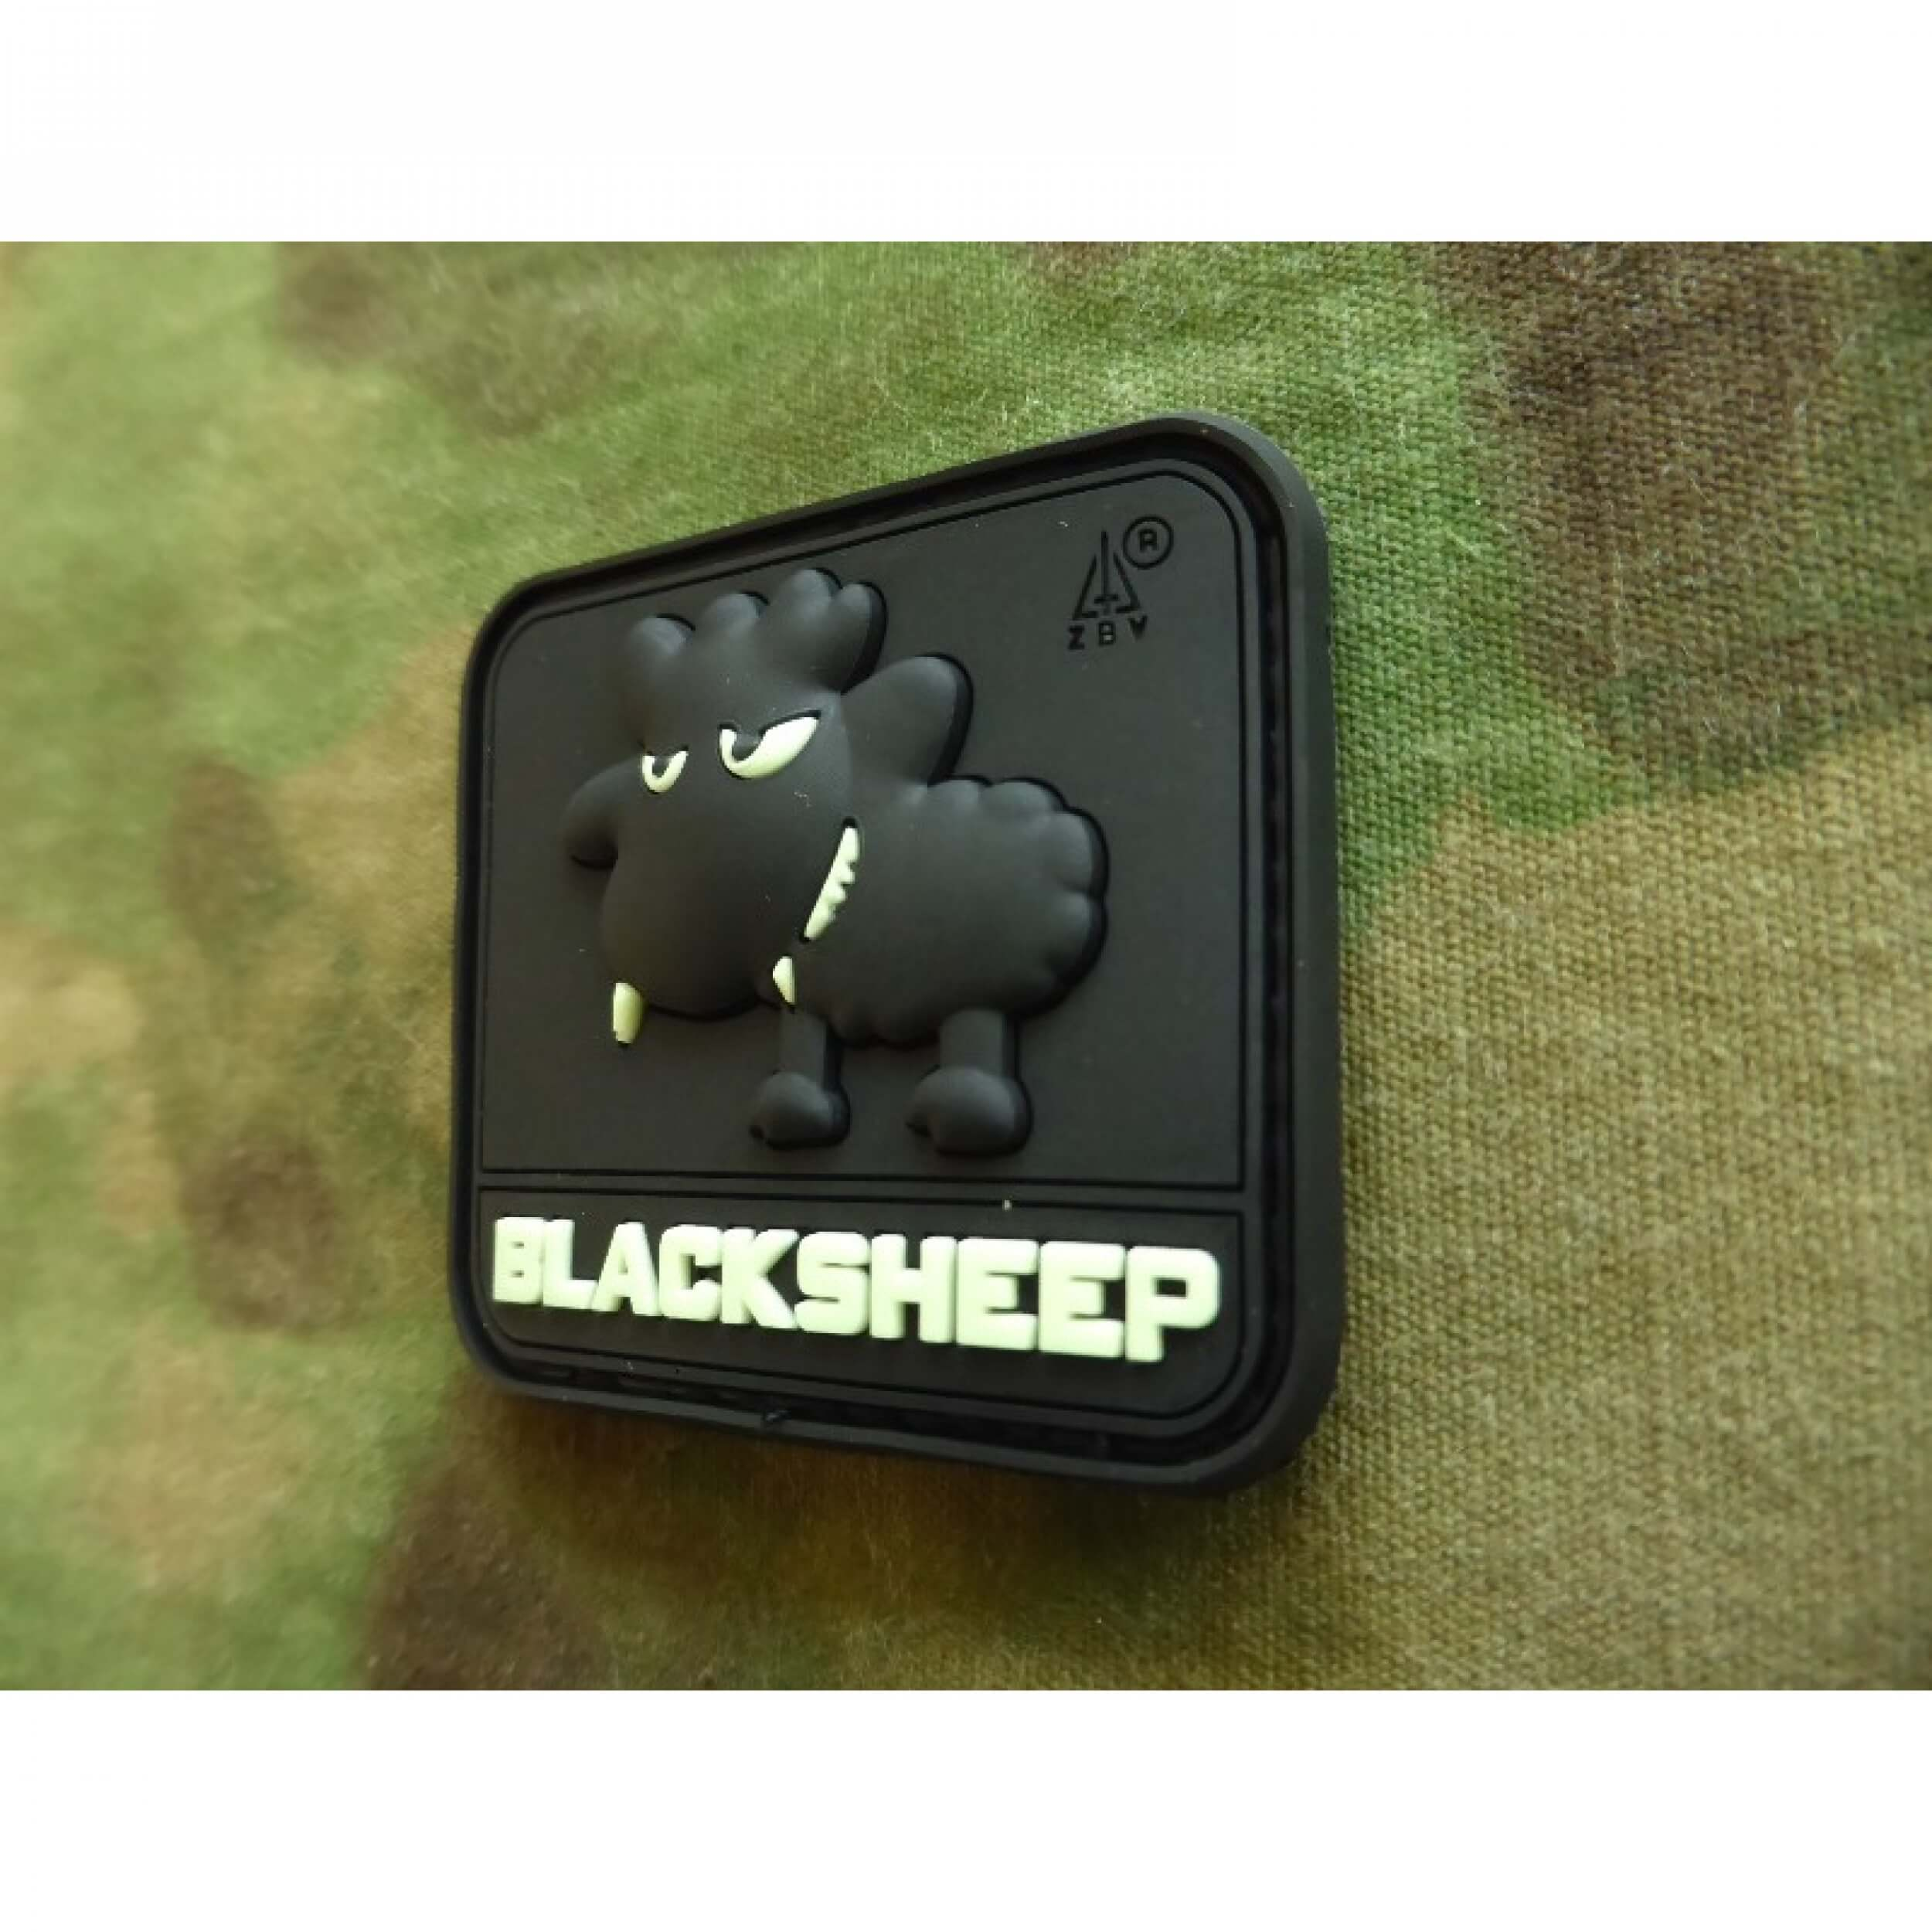 JTG Little BlackSheep Patch, gid (glow in the dark) / 3D Rubber Patch